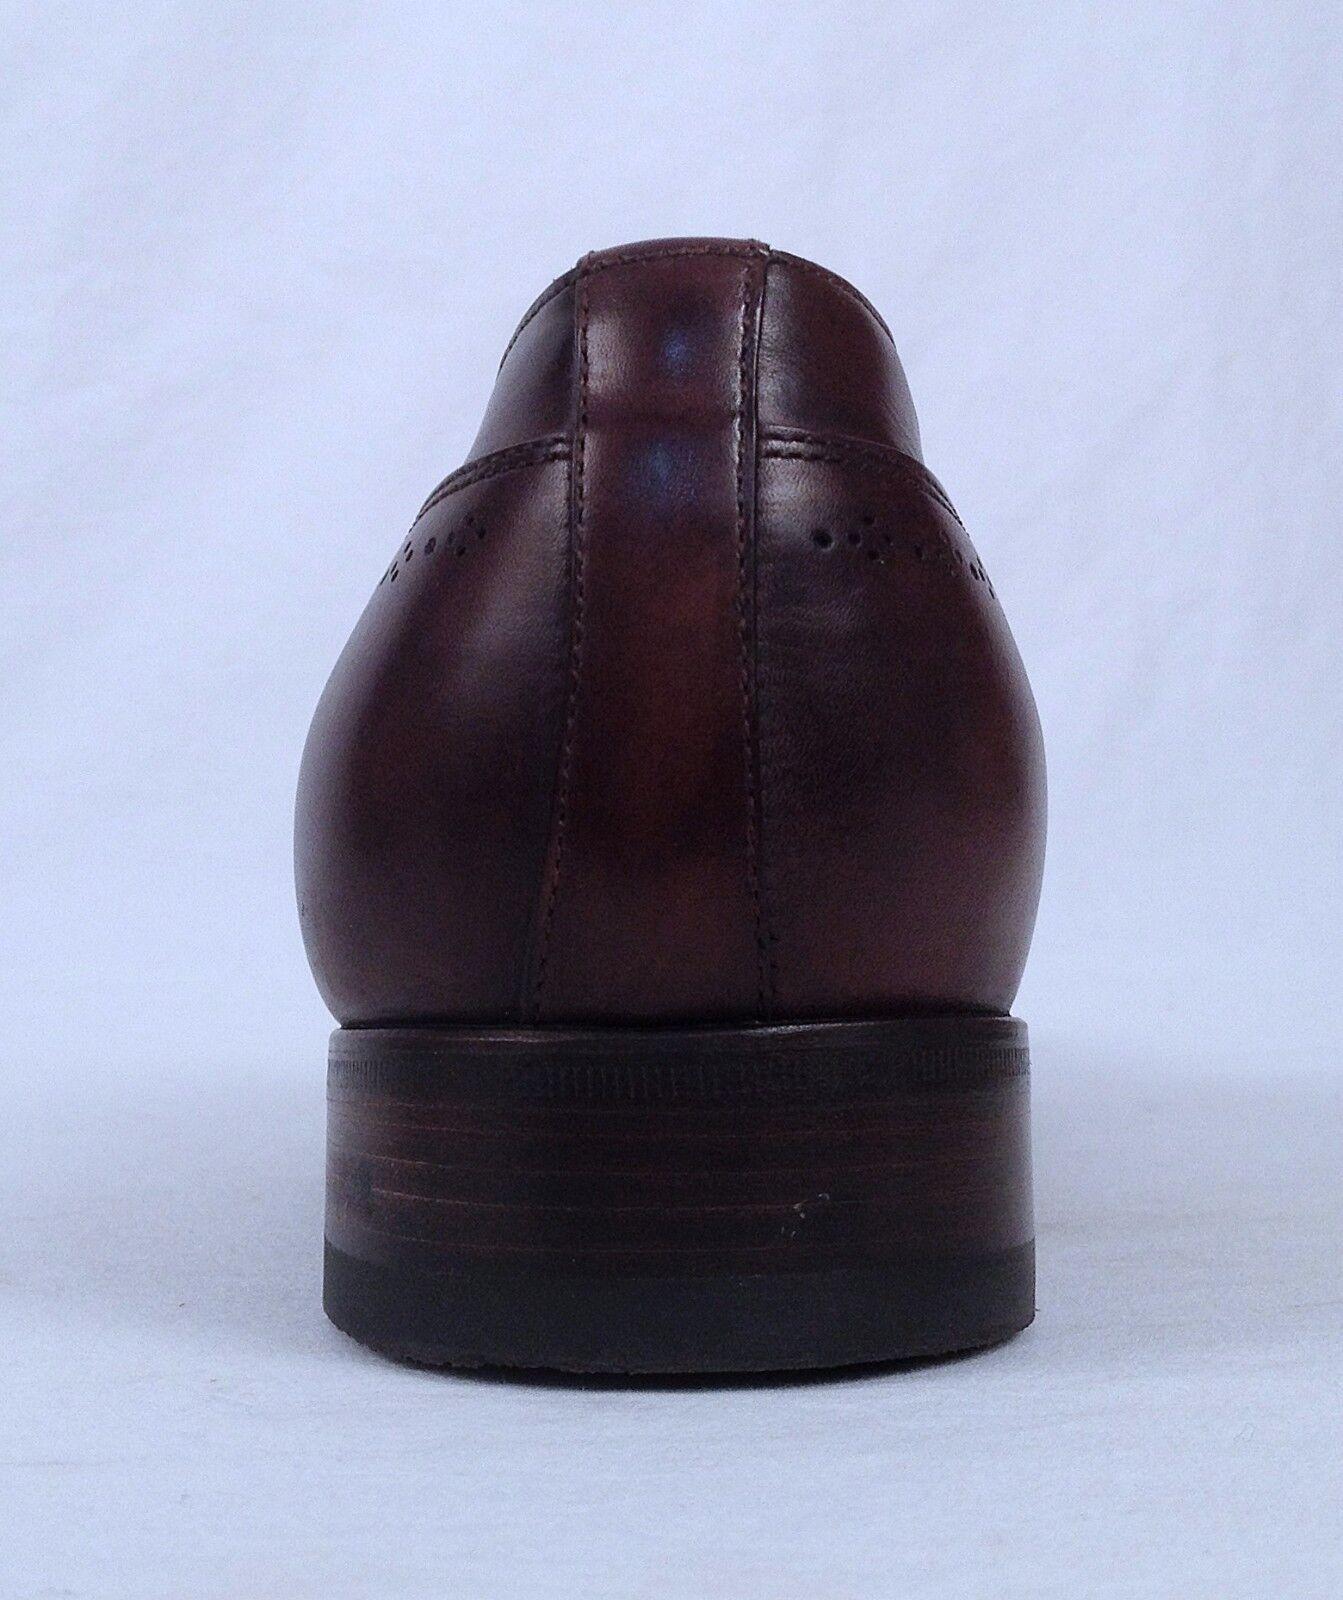 Santoni Medallion Cap Größe Toe Oxford- braun Calf- Größe Cap 11 D  798 (TB4) 96cbf3